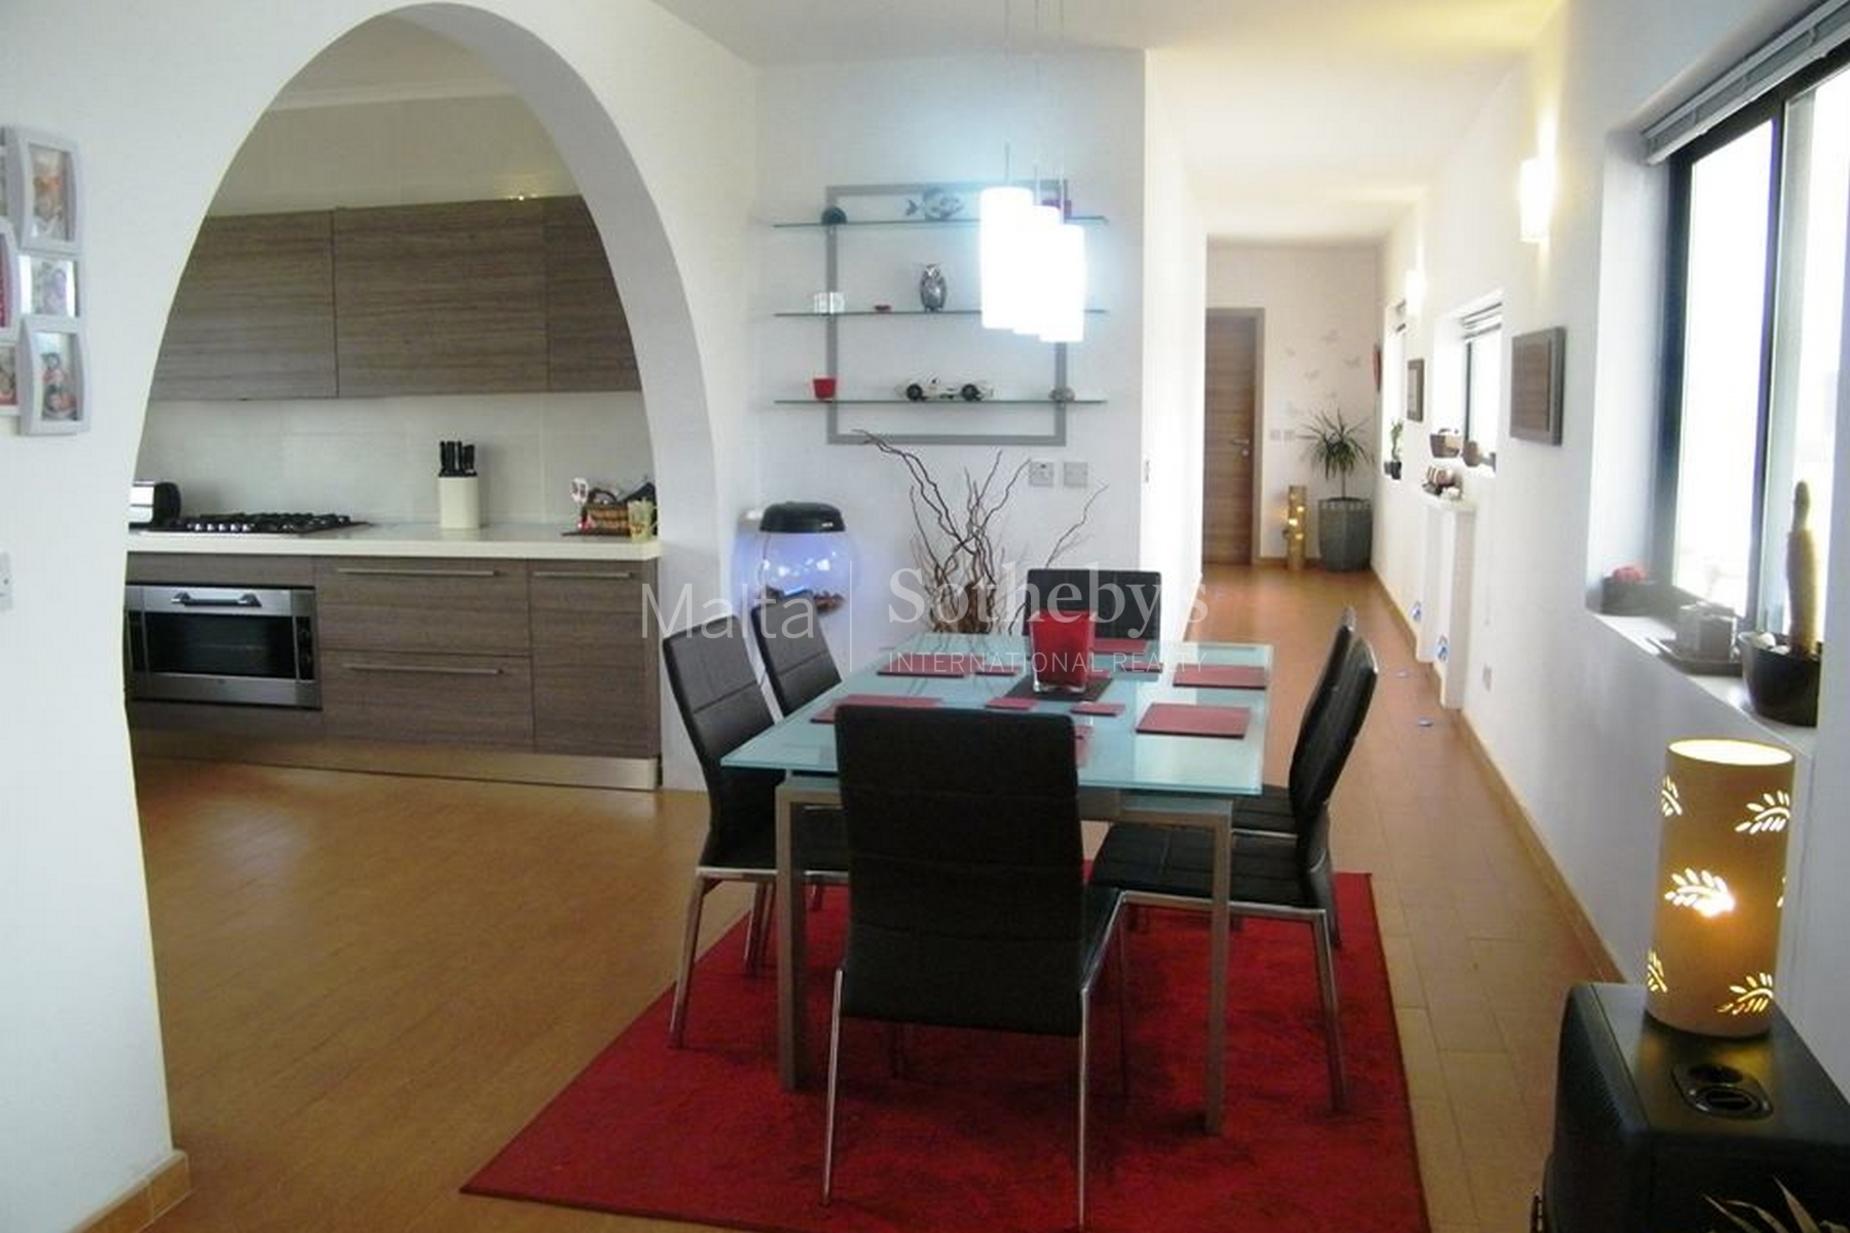 3 bed Penthouse For Rent in Zabbar, Zabbar - thumb 12